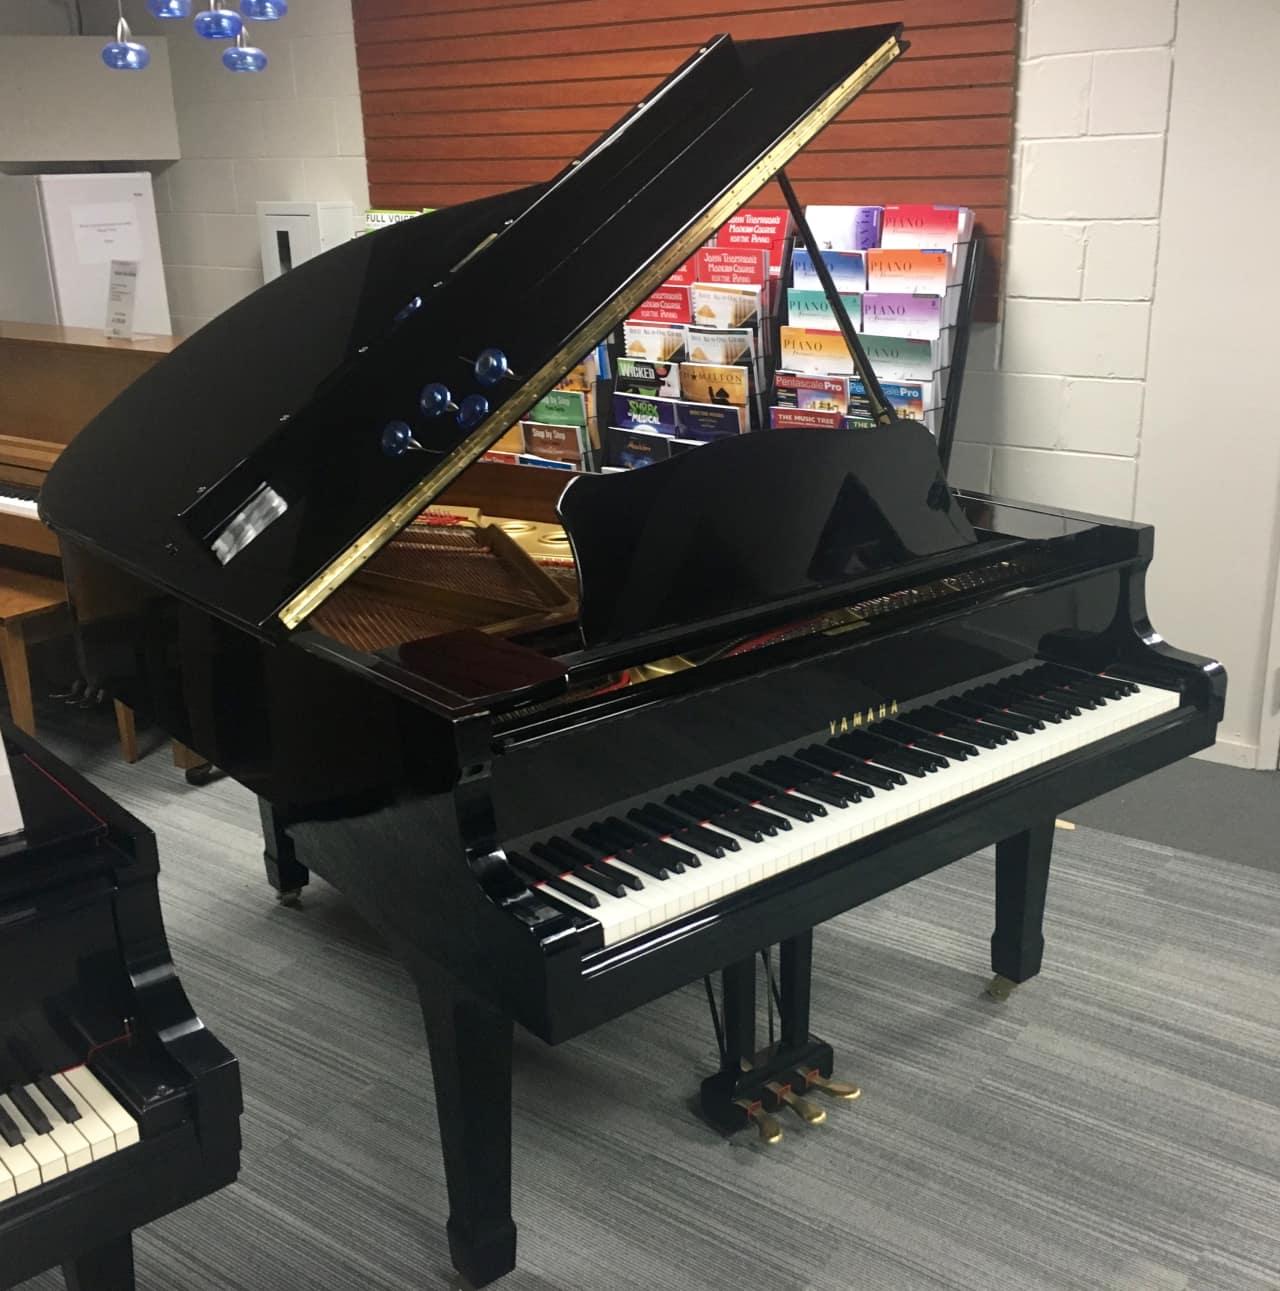 Yamaha c3 conservatory 6 39 1 grand piano polished ebony reverb for Yamaha c3 piano review